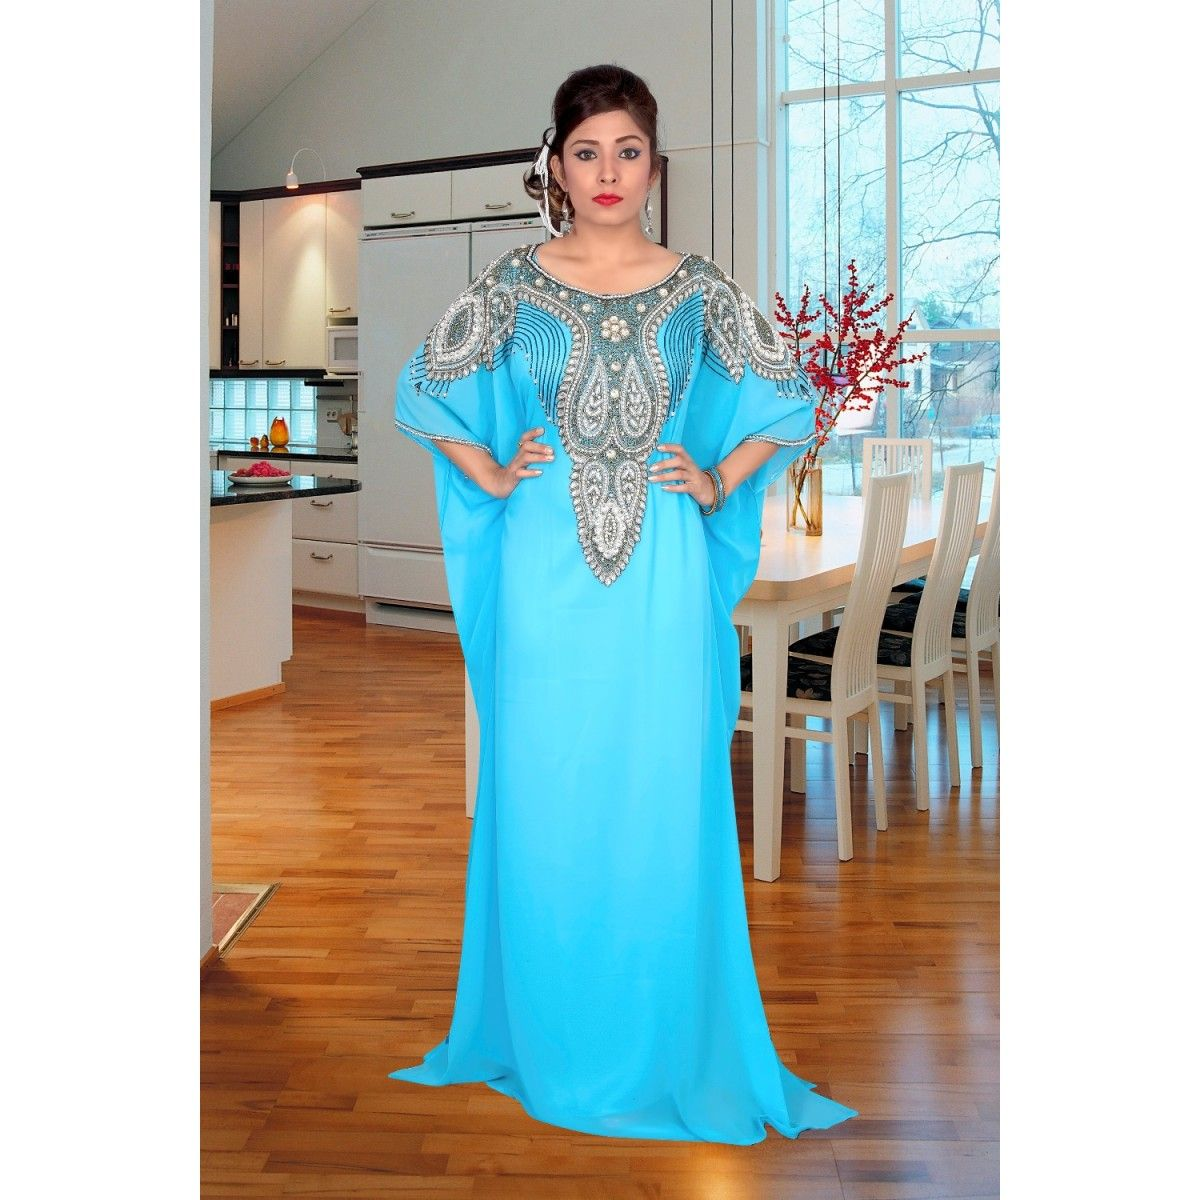 DUBAI VERY FANCY KAFTANS/ abaya jalabiya Ladies Maxi Dress Wedding ...